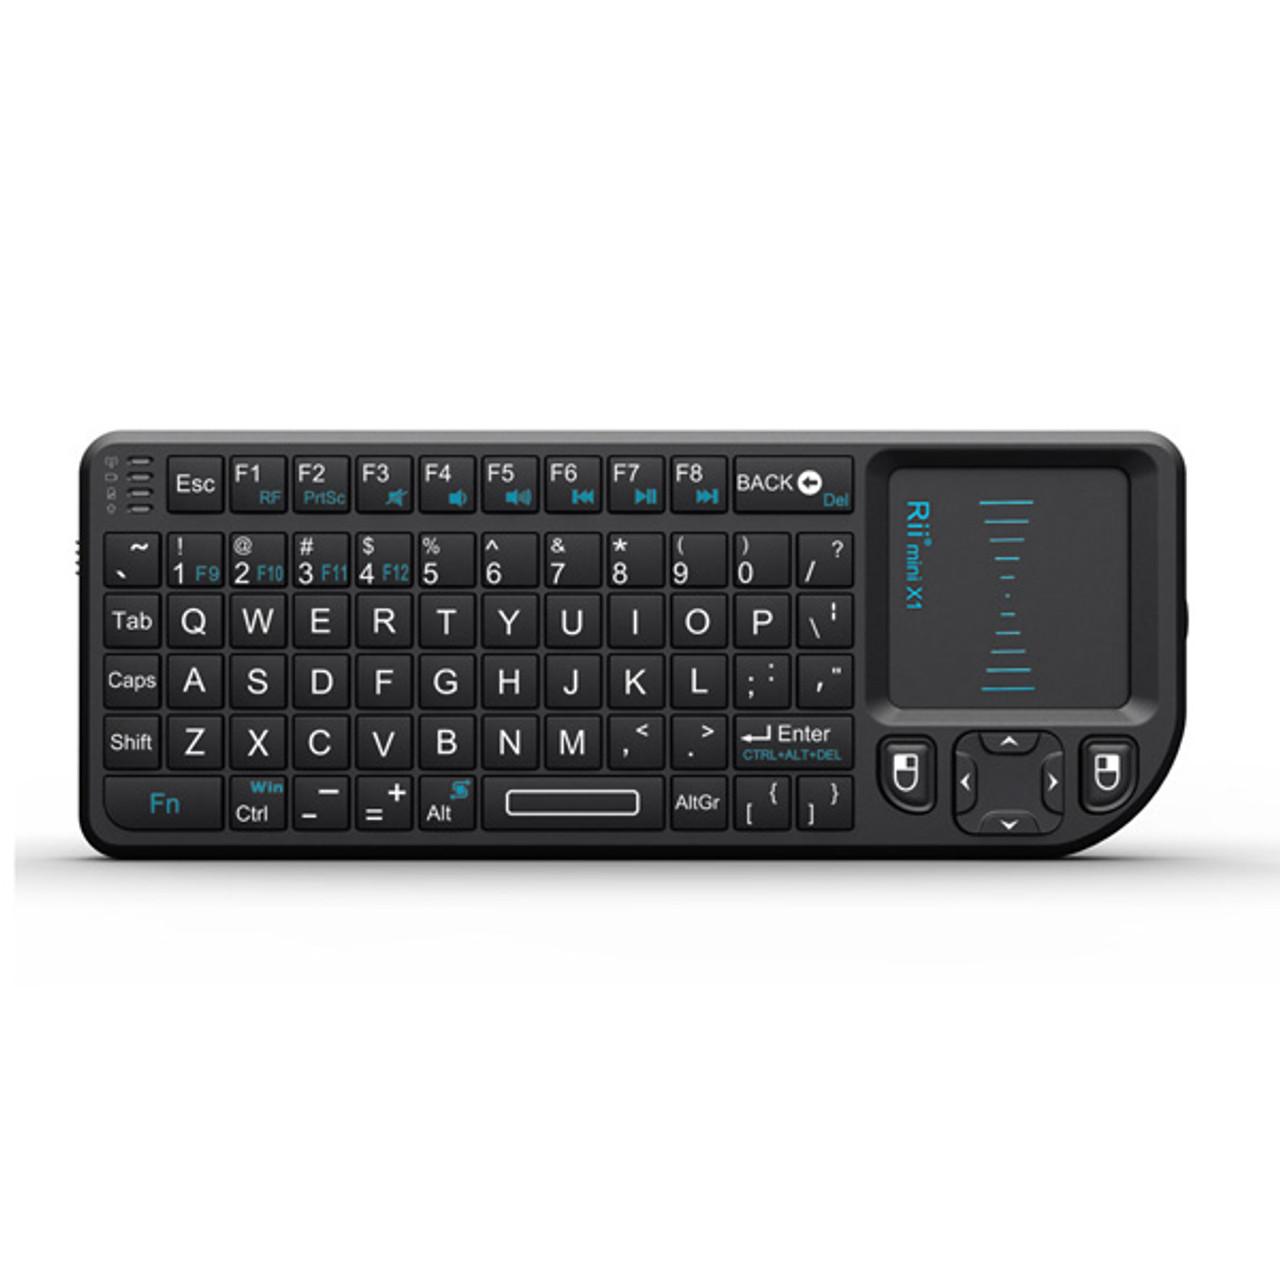 Riitek Ultra Mini Wireless Keyboard with Mouse Pad – No Laser Pointer